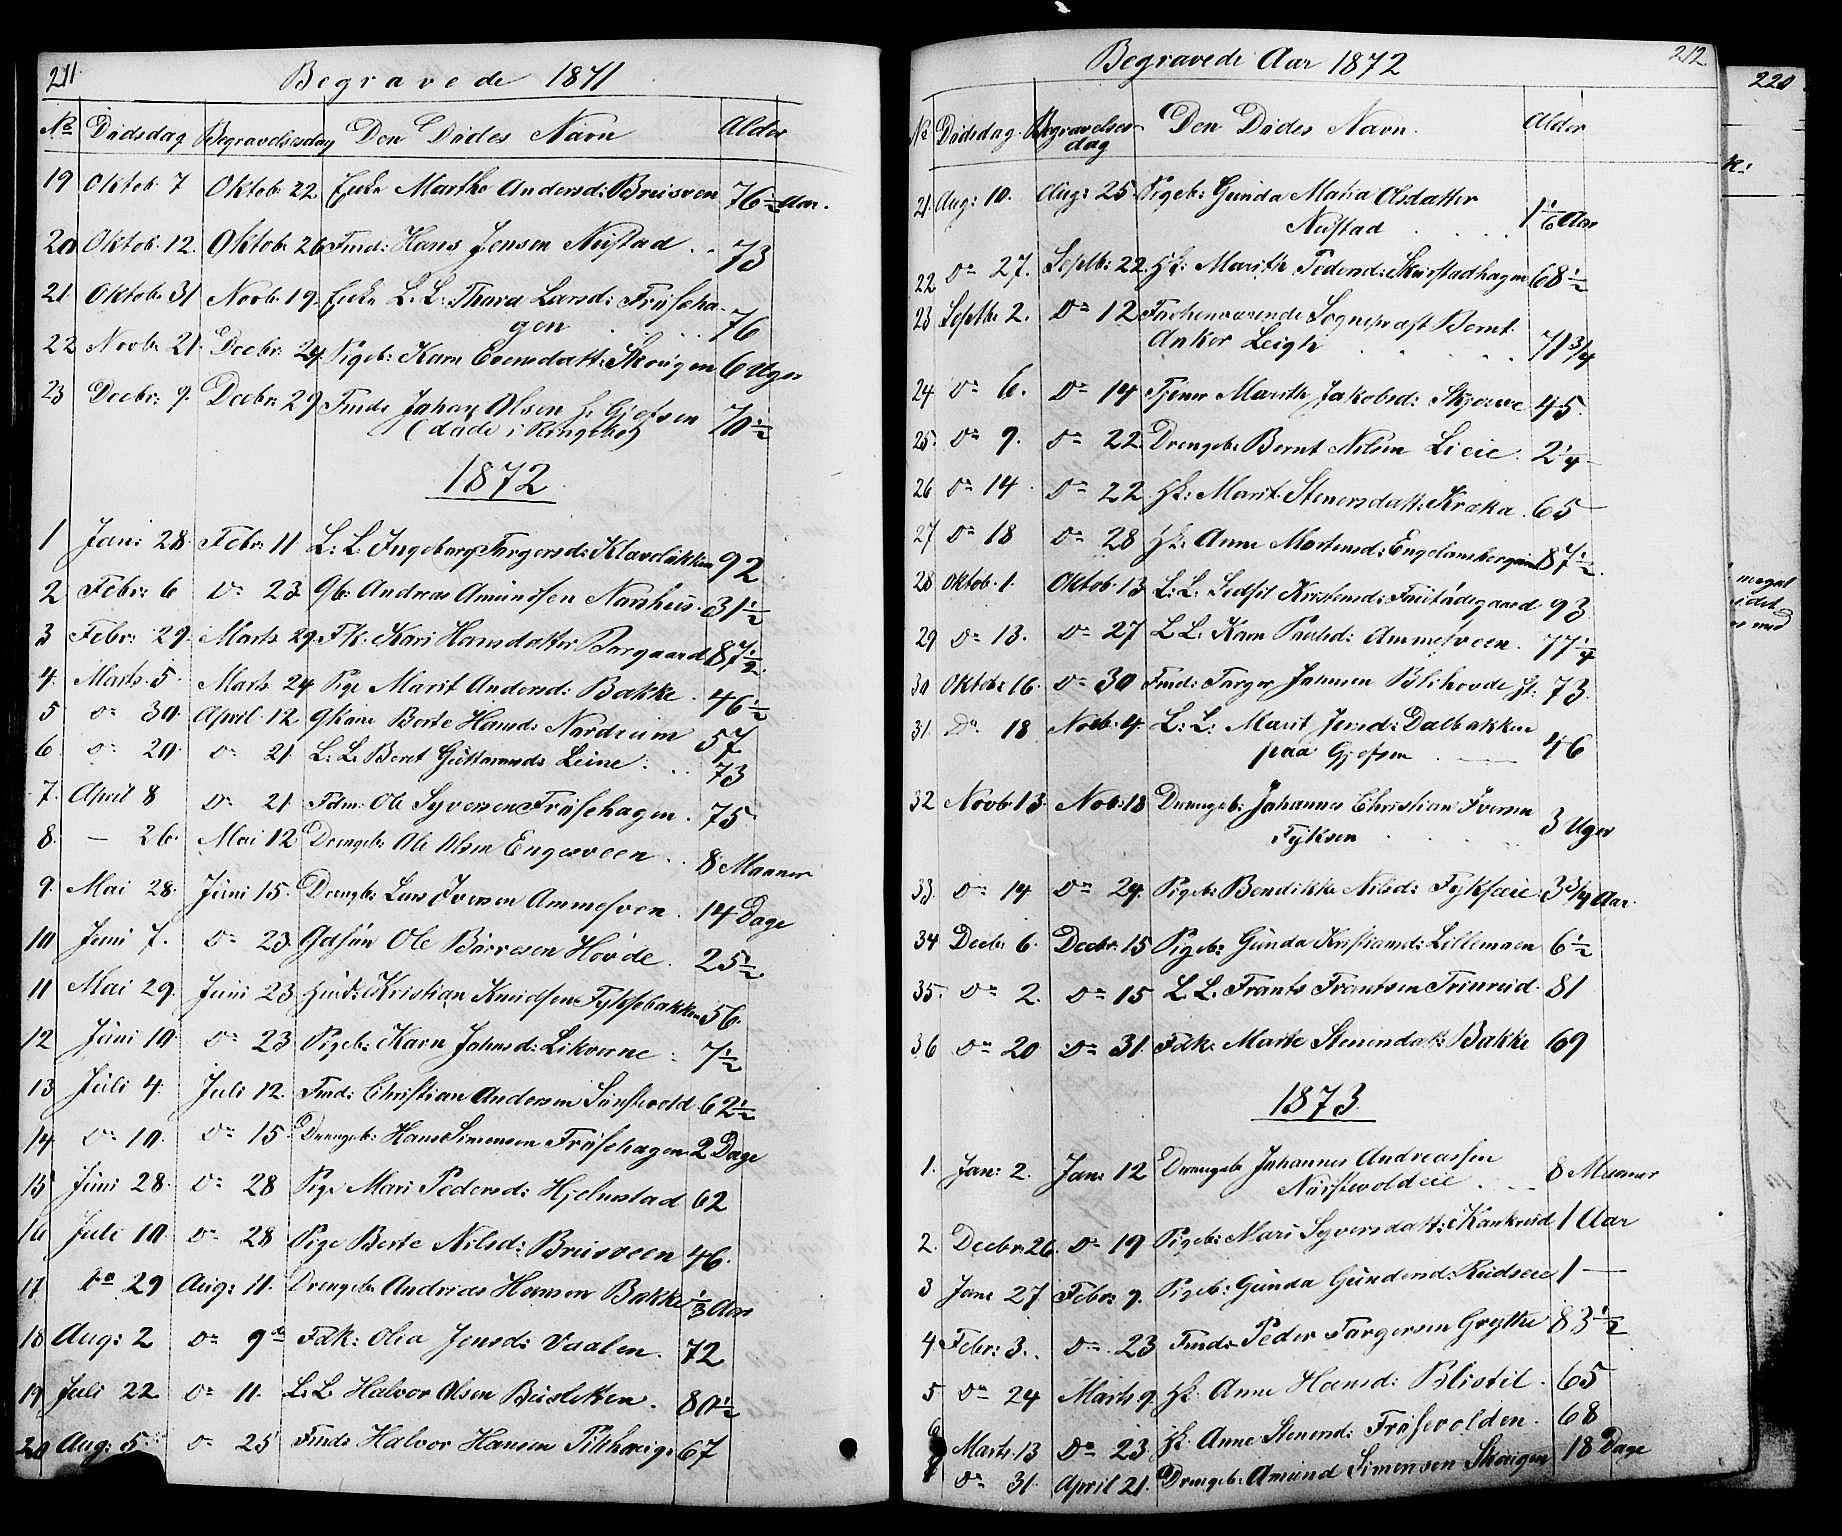 SAH, Østre Gausdal prestekontor, Klokkerbok nr. 1, 1863-1893, s. 211-212